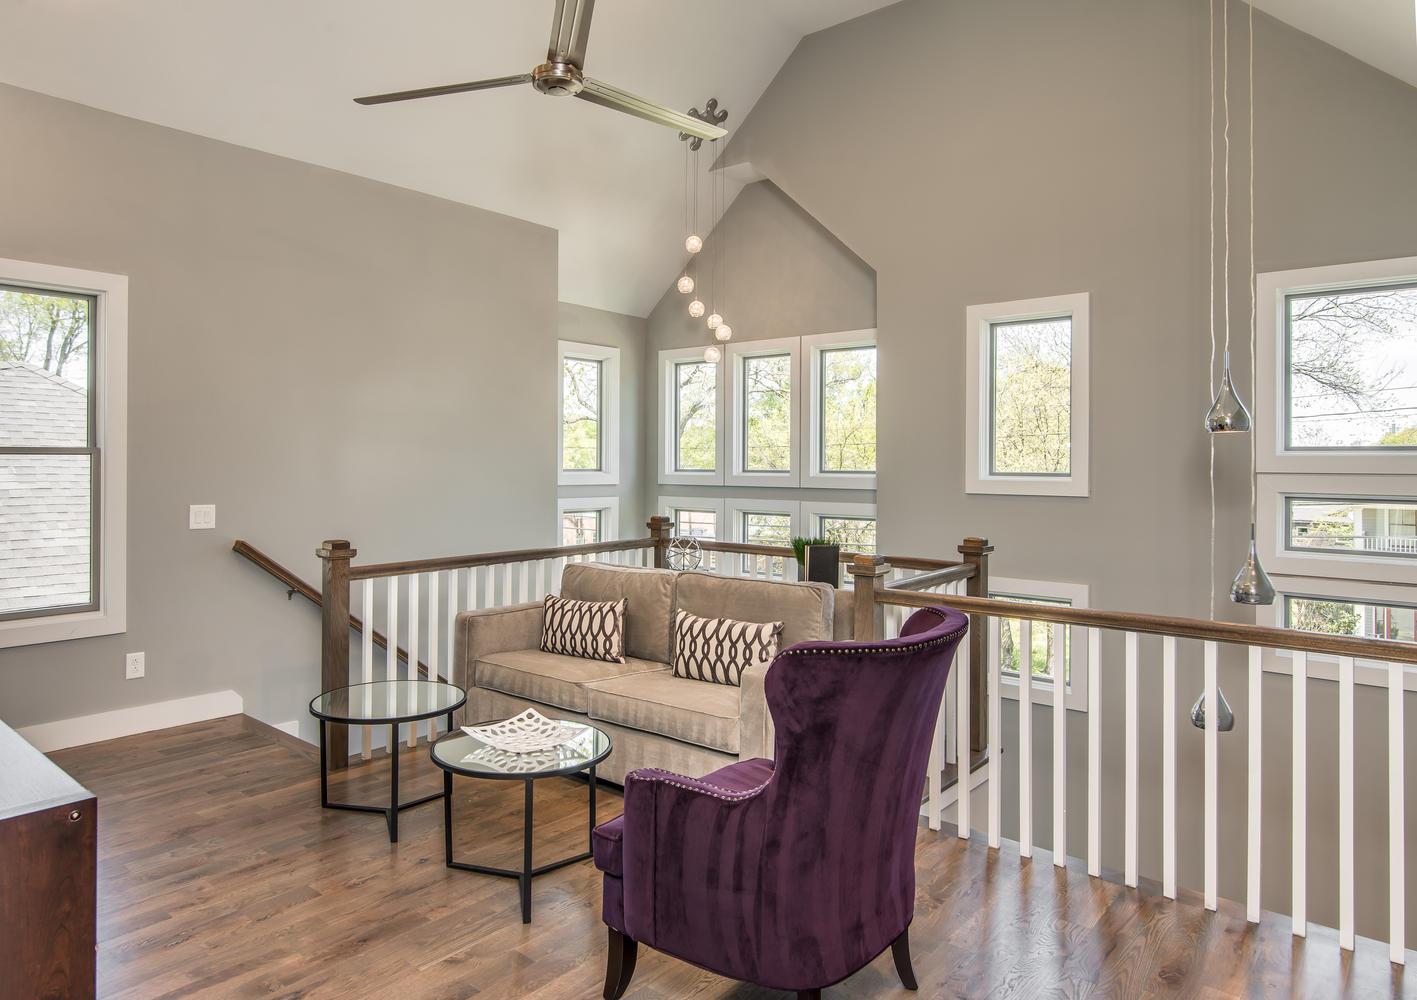 House-Plans-Online-Duplex-Nashville-Peggy-Newman-Bonus-1613.jpg